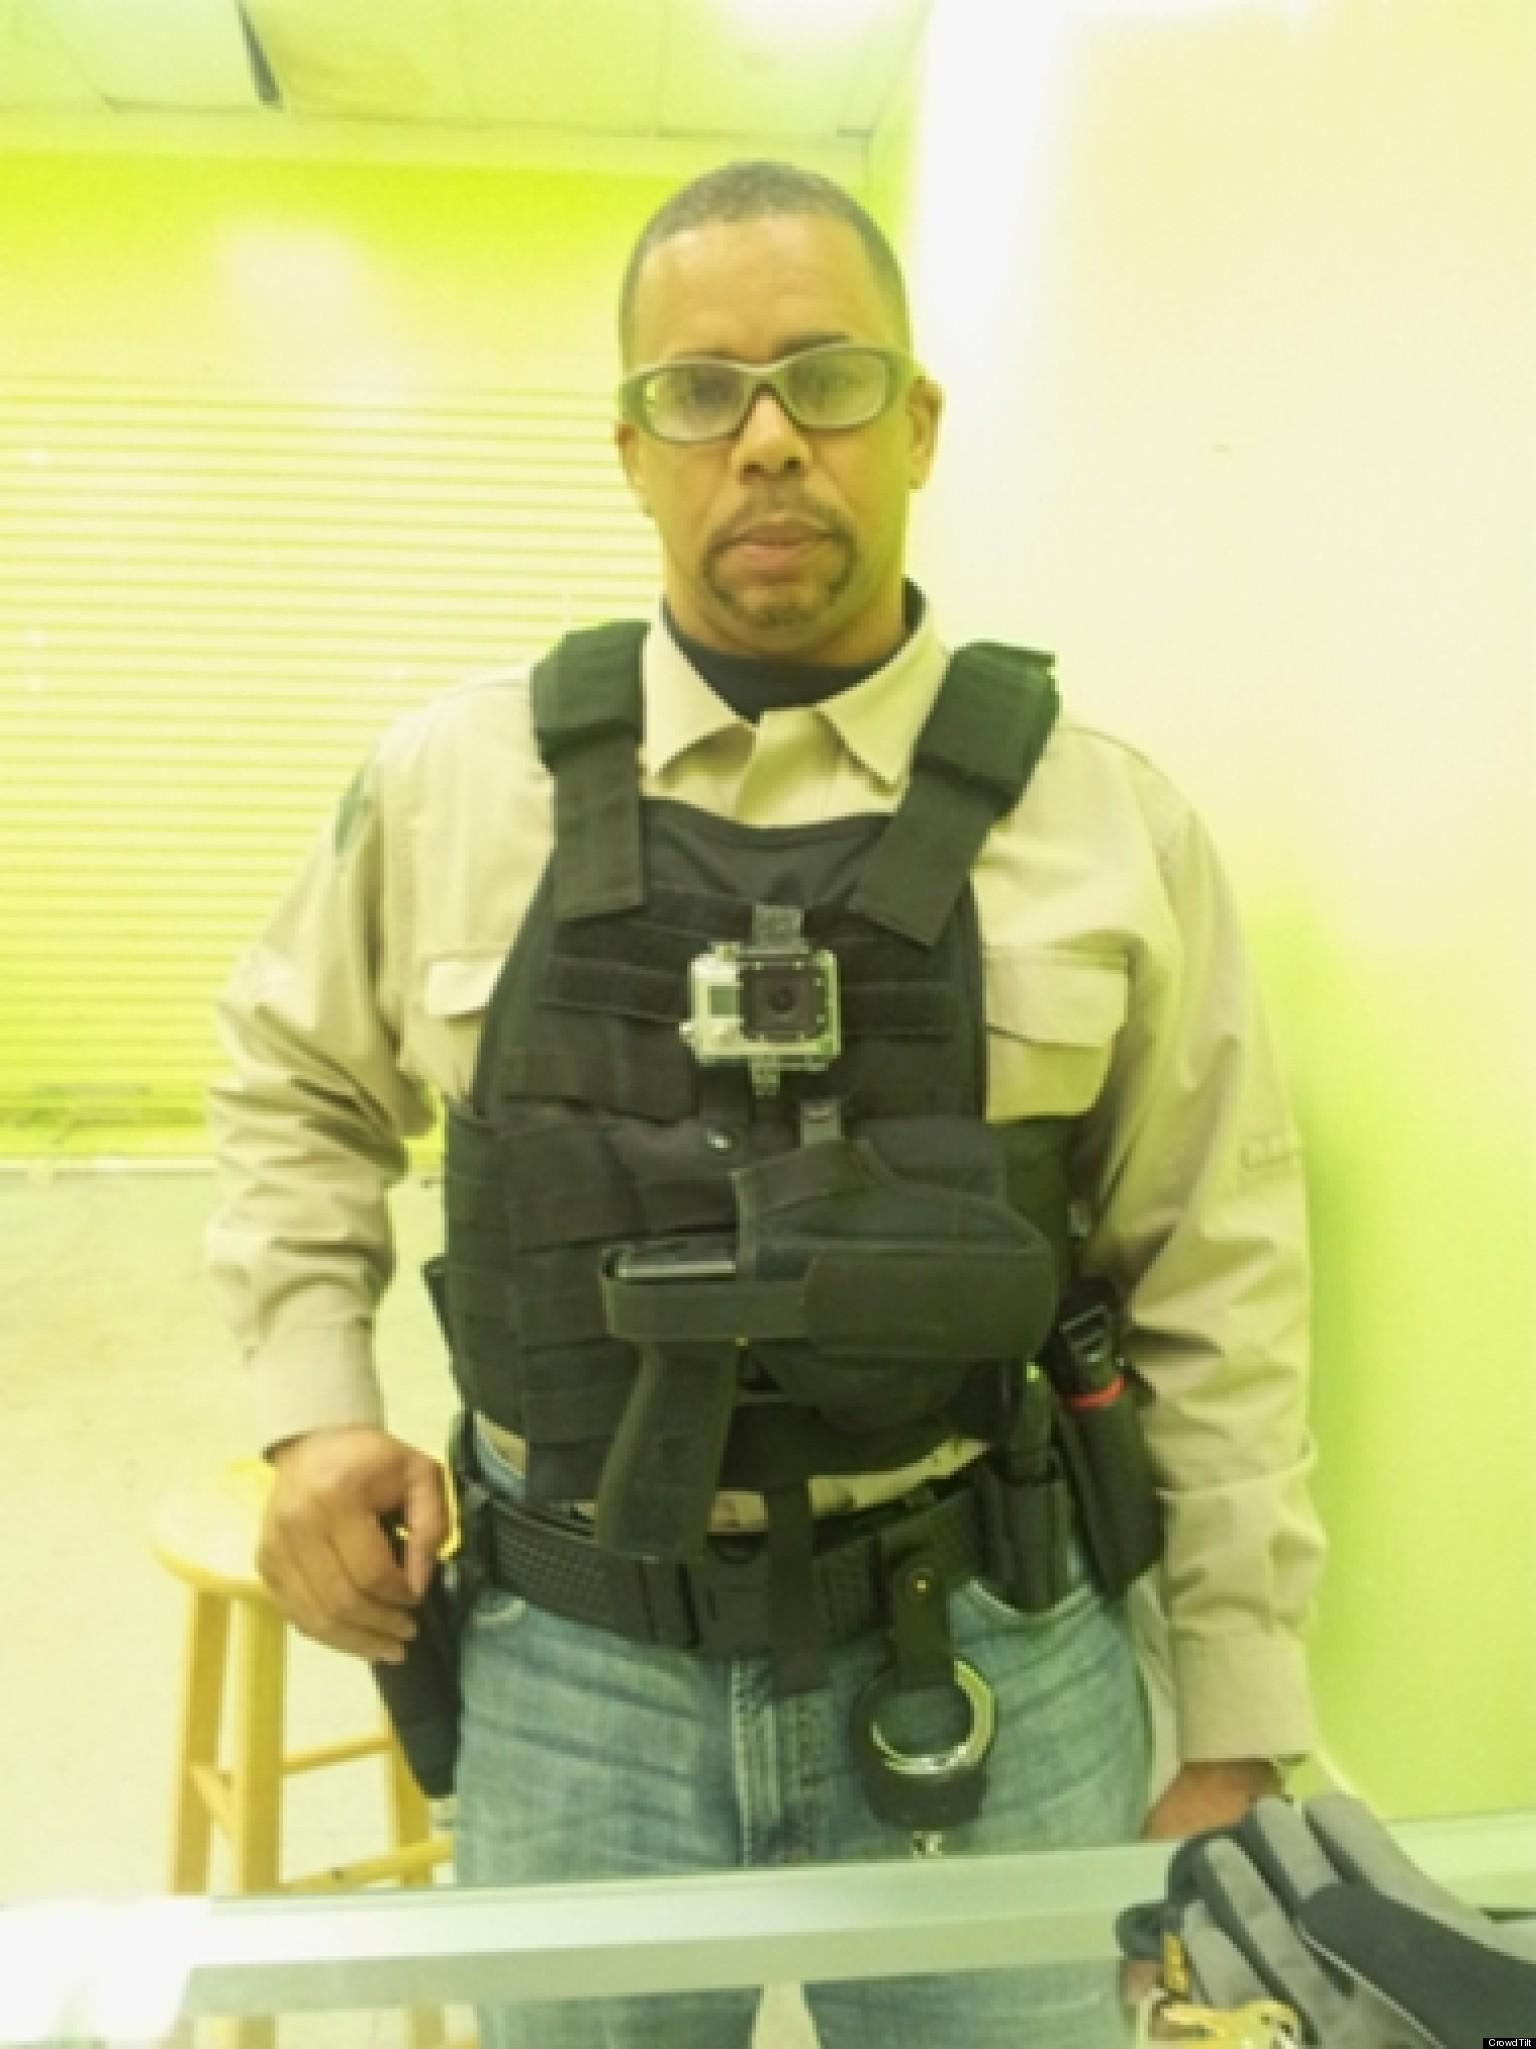 Guard Mall Atlanta Security